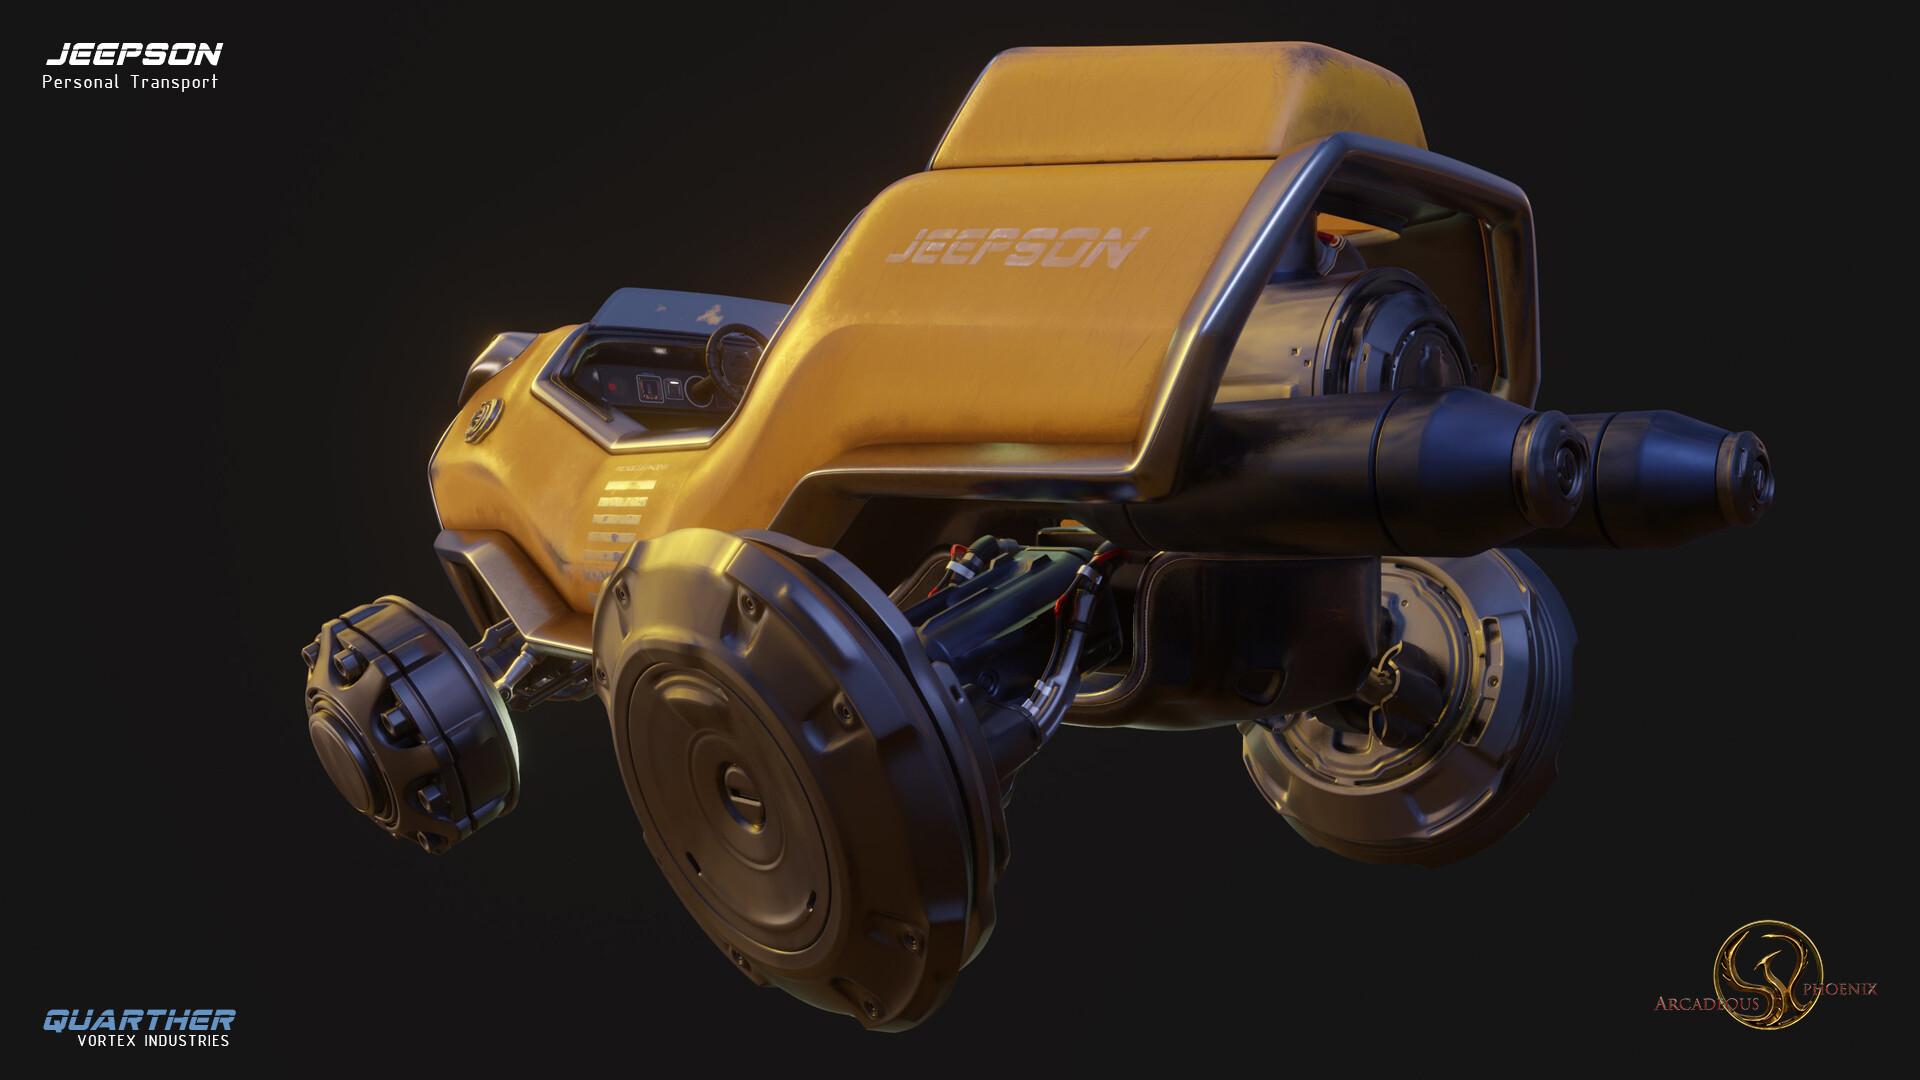 Arcadeous phoenix jeepson camera3